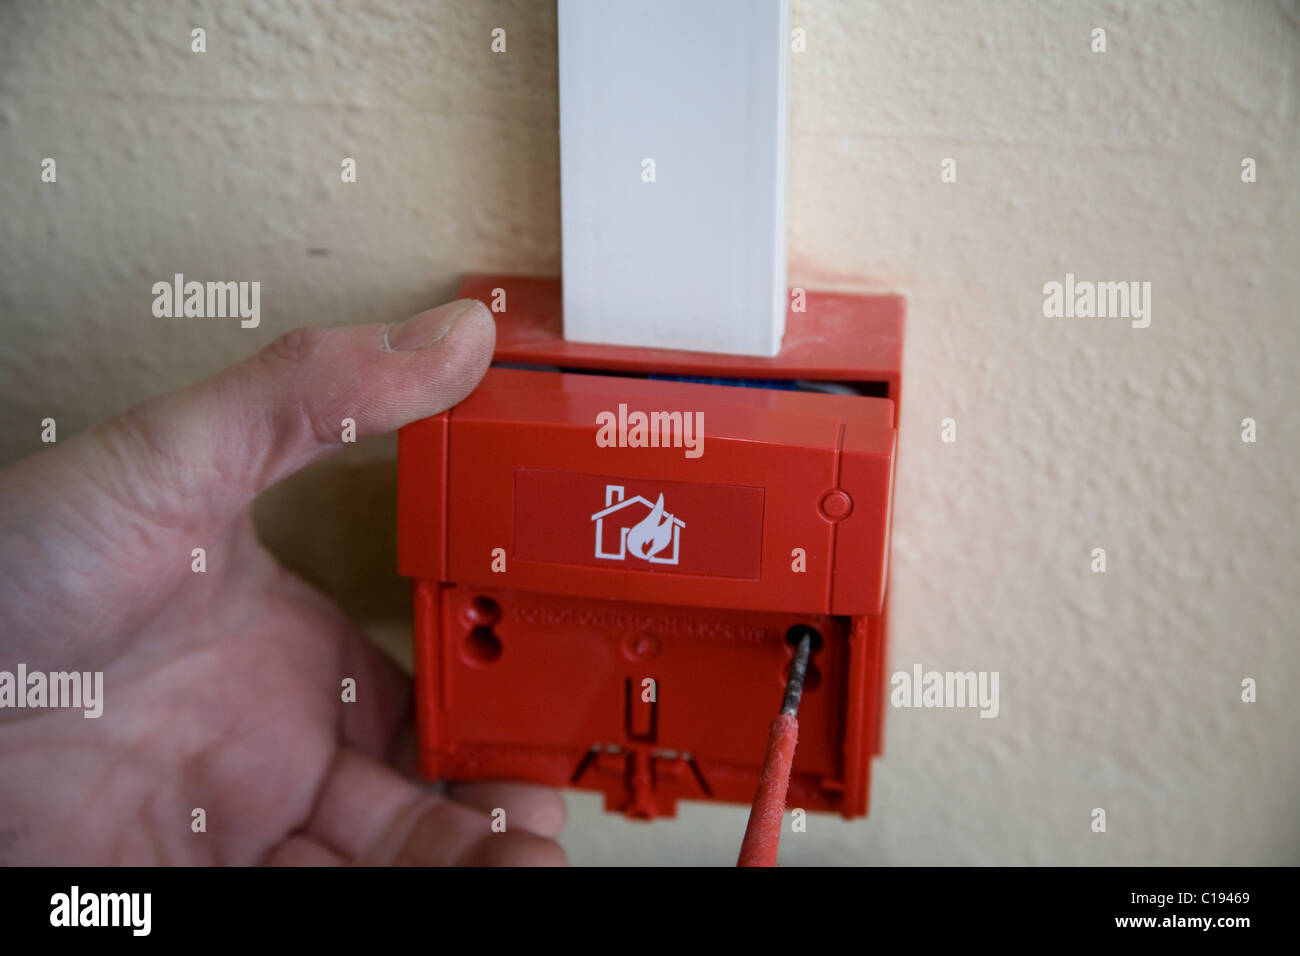 Fire Alarm Break Glass Alarm Stockfotos & Fire Alarm Break Glass ...